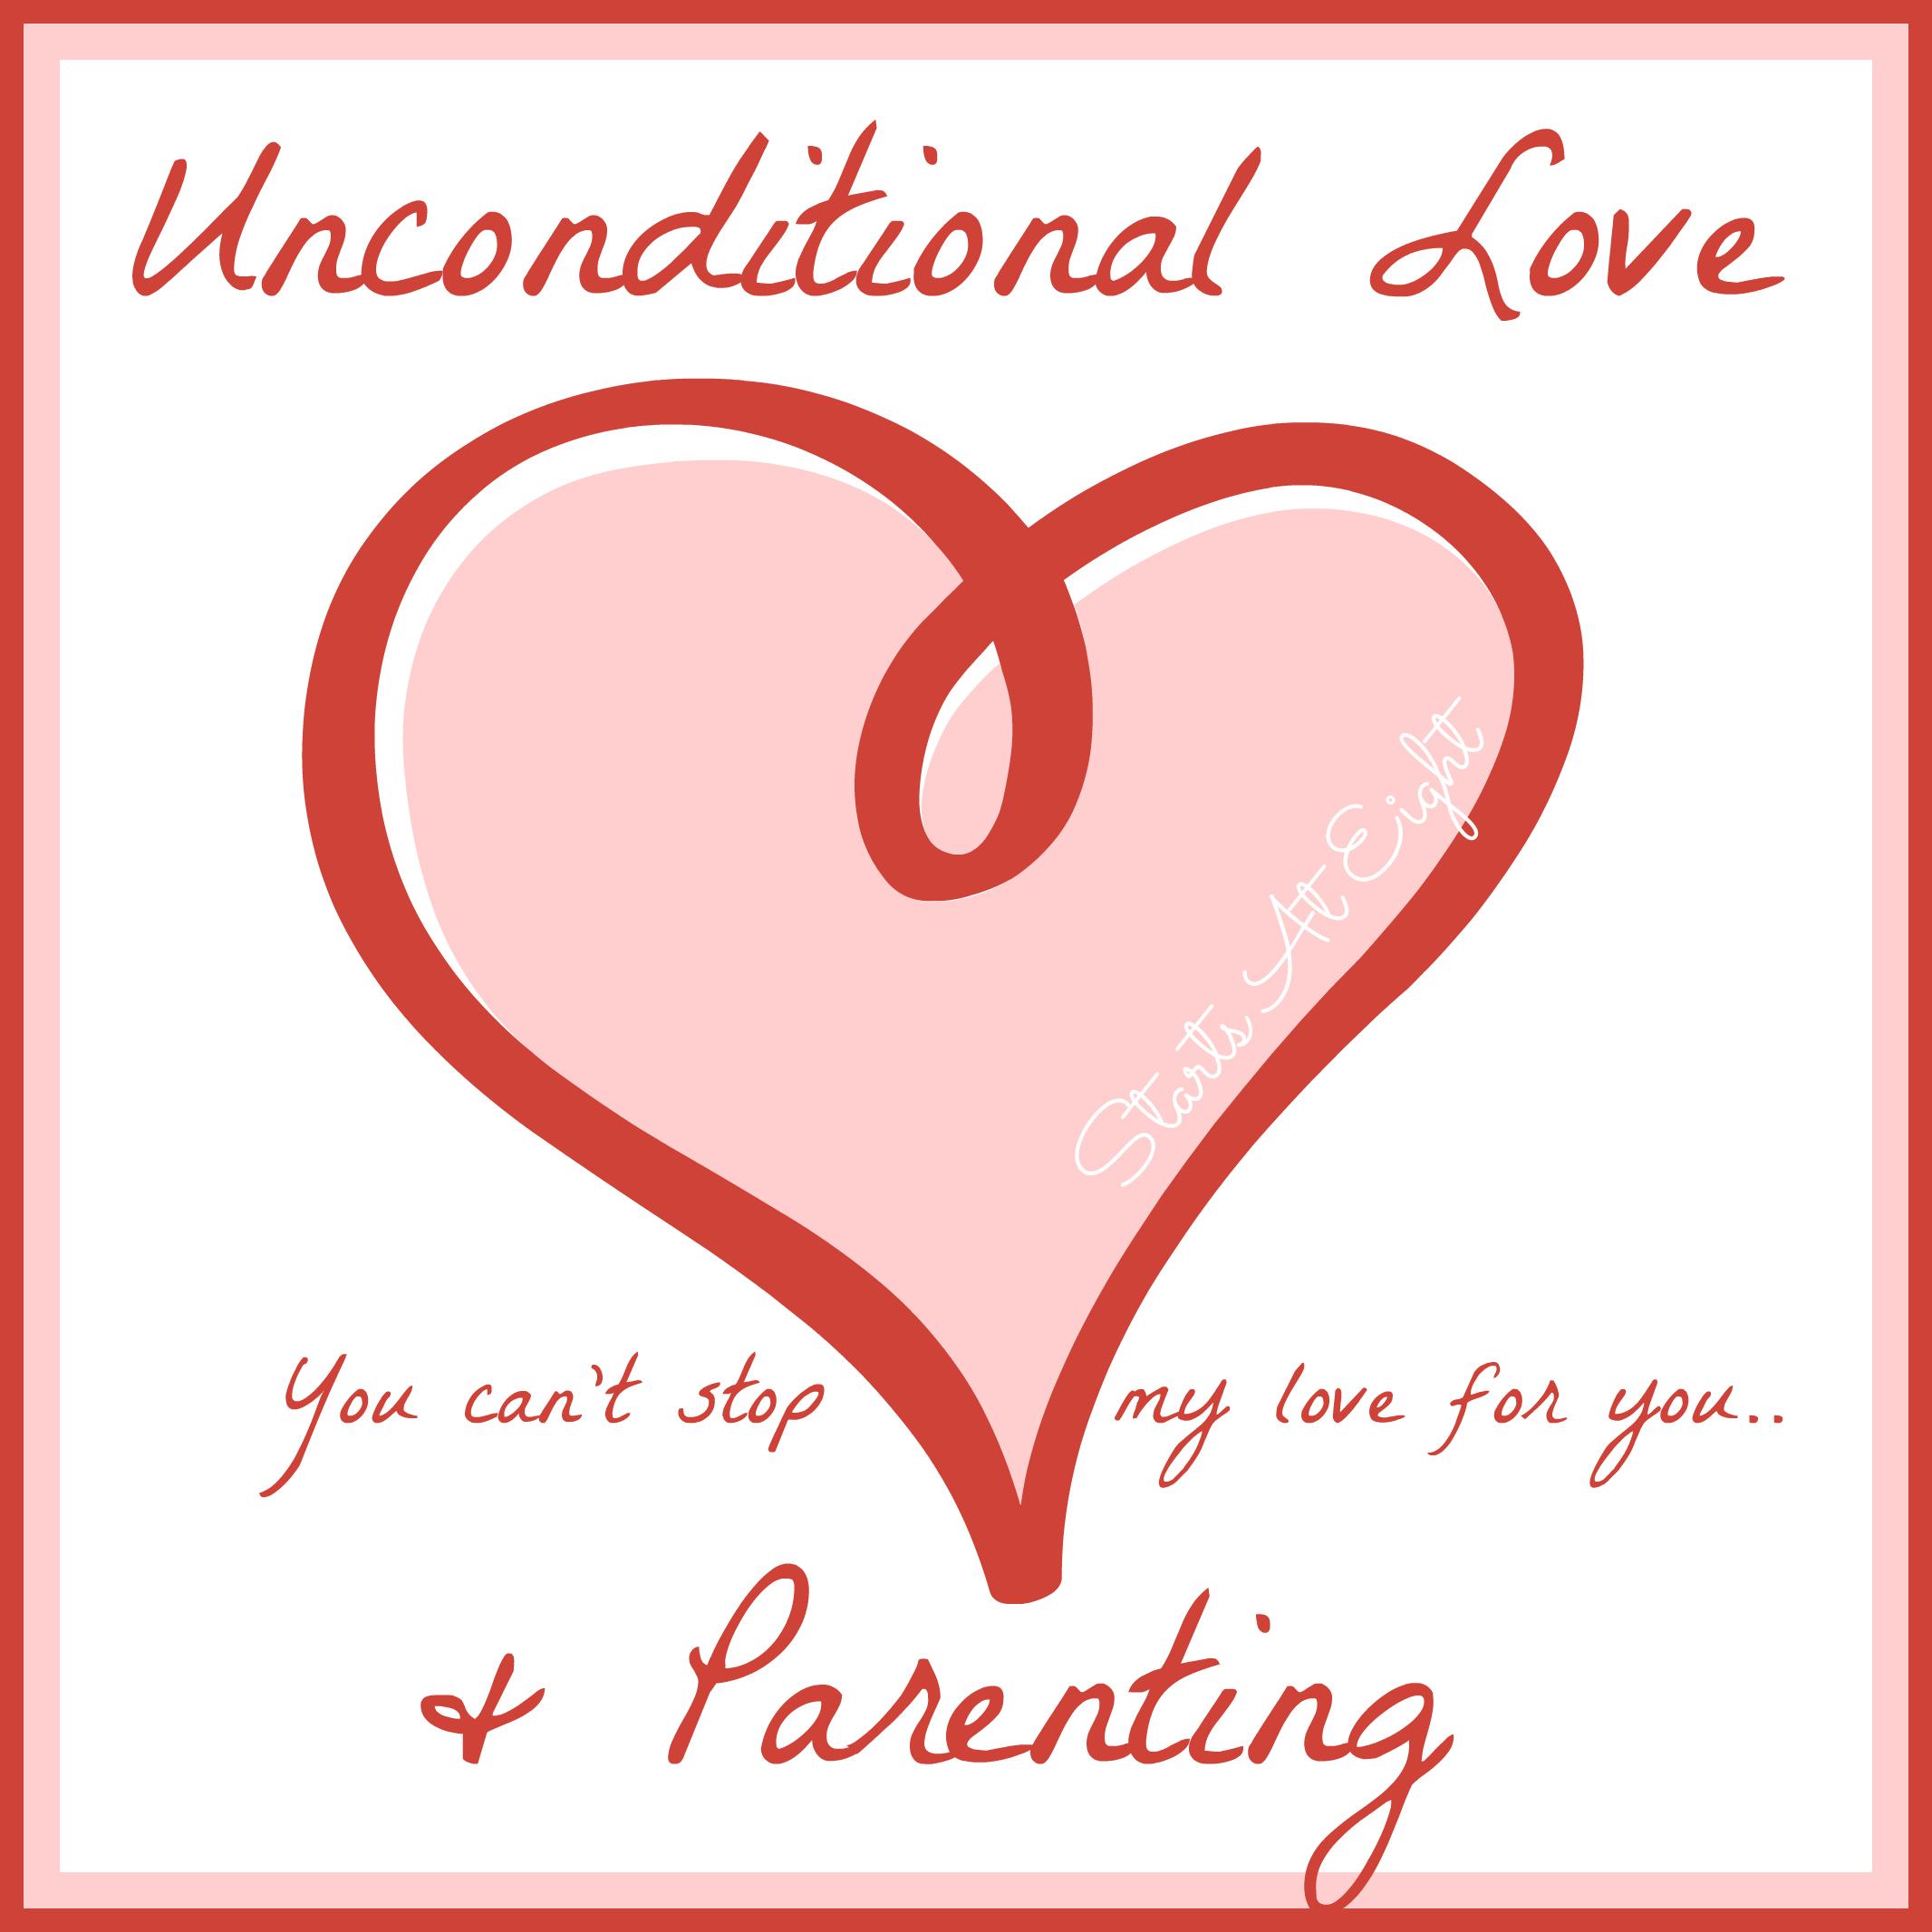 Unconditional Love & Parenting